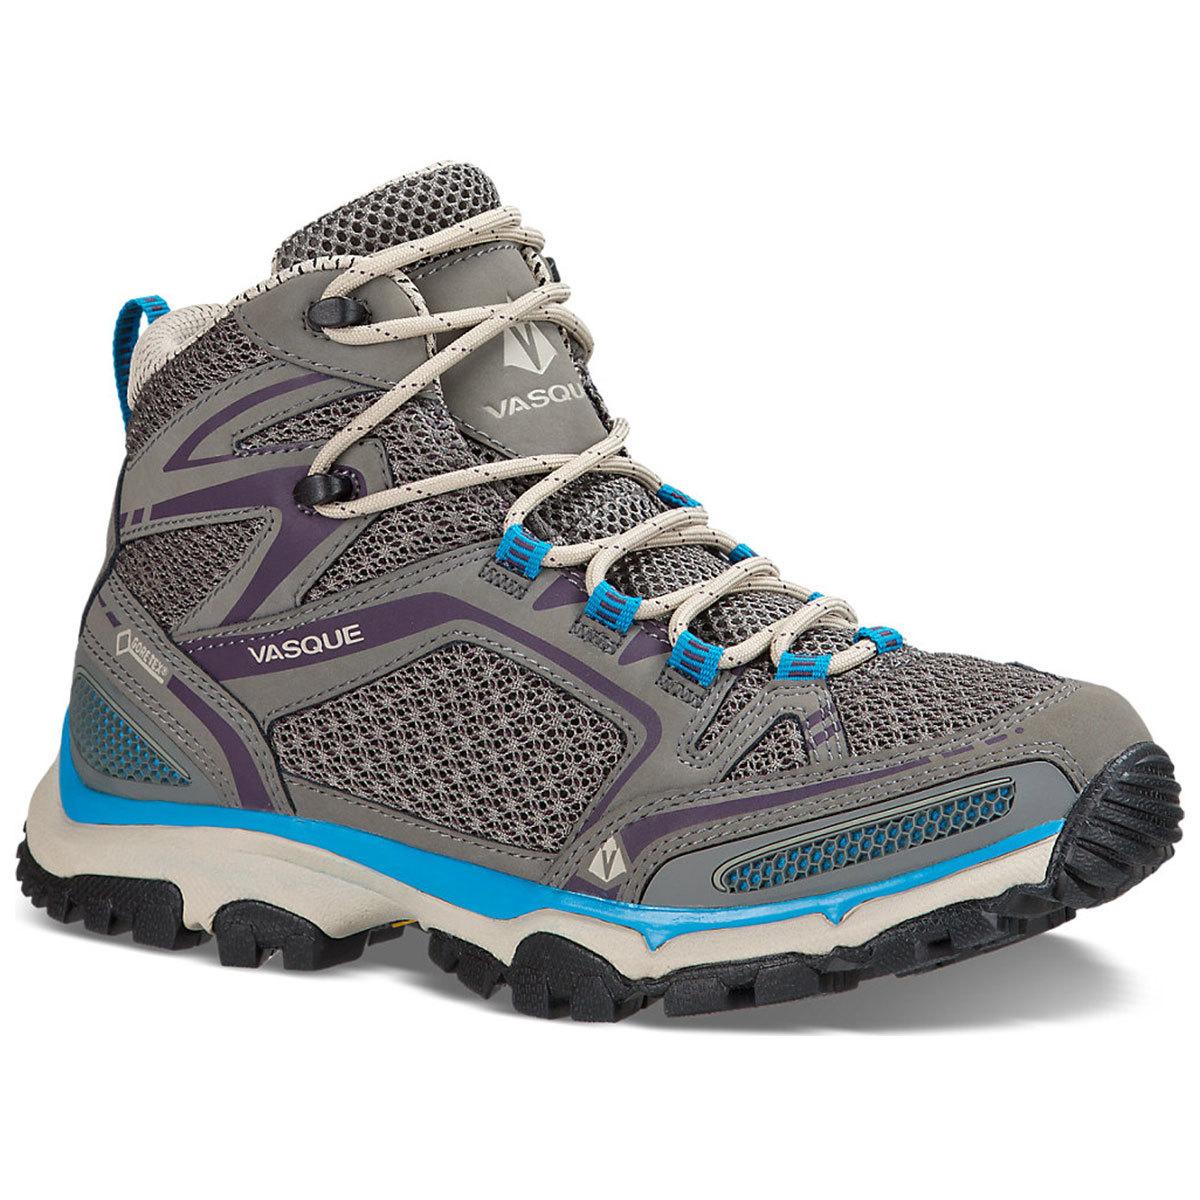 Vasque Women's Inhaler Ii Gtx Hiking Boots, Moon Mist/plum - Black, 8